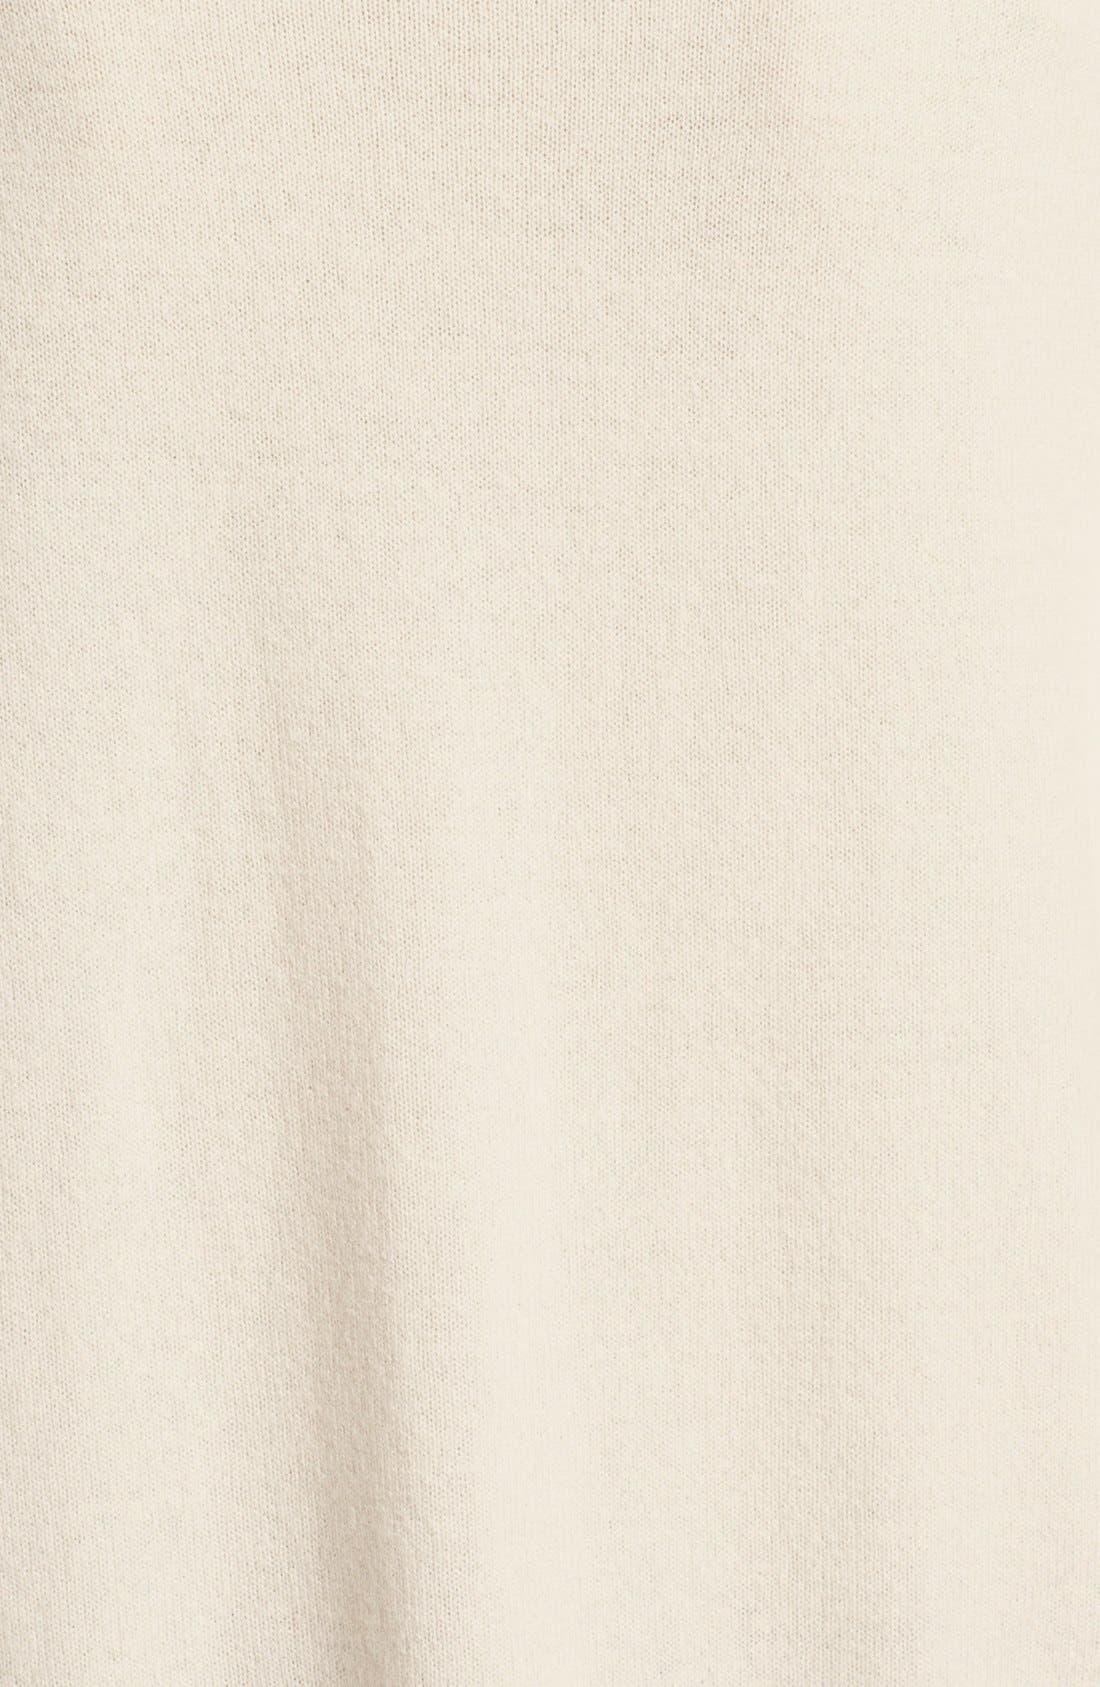 Alternate Image 3  - Vince 'Square' Raglan Cashmere Sweater